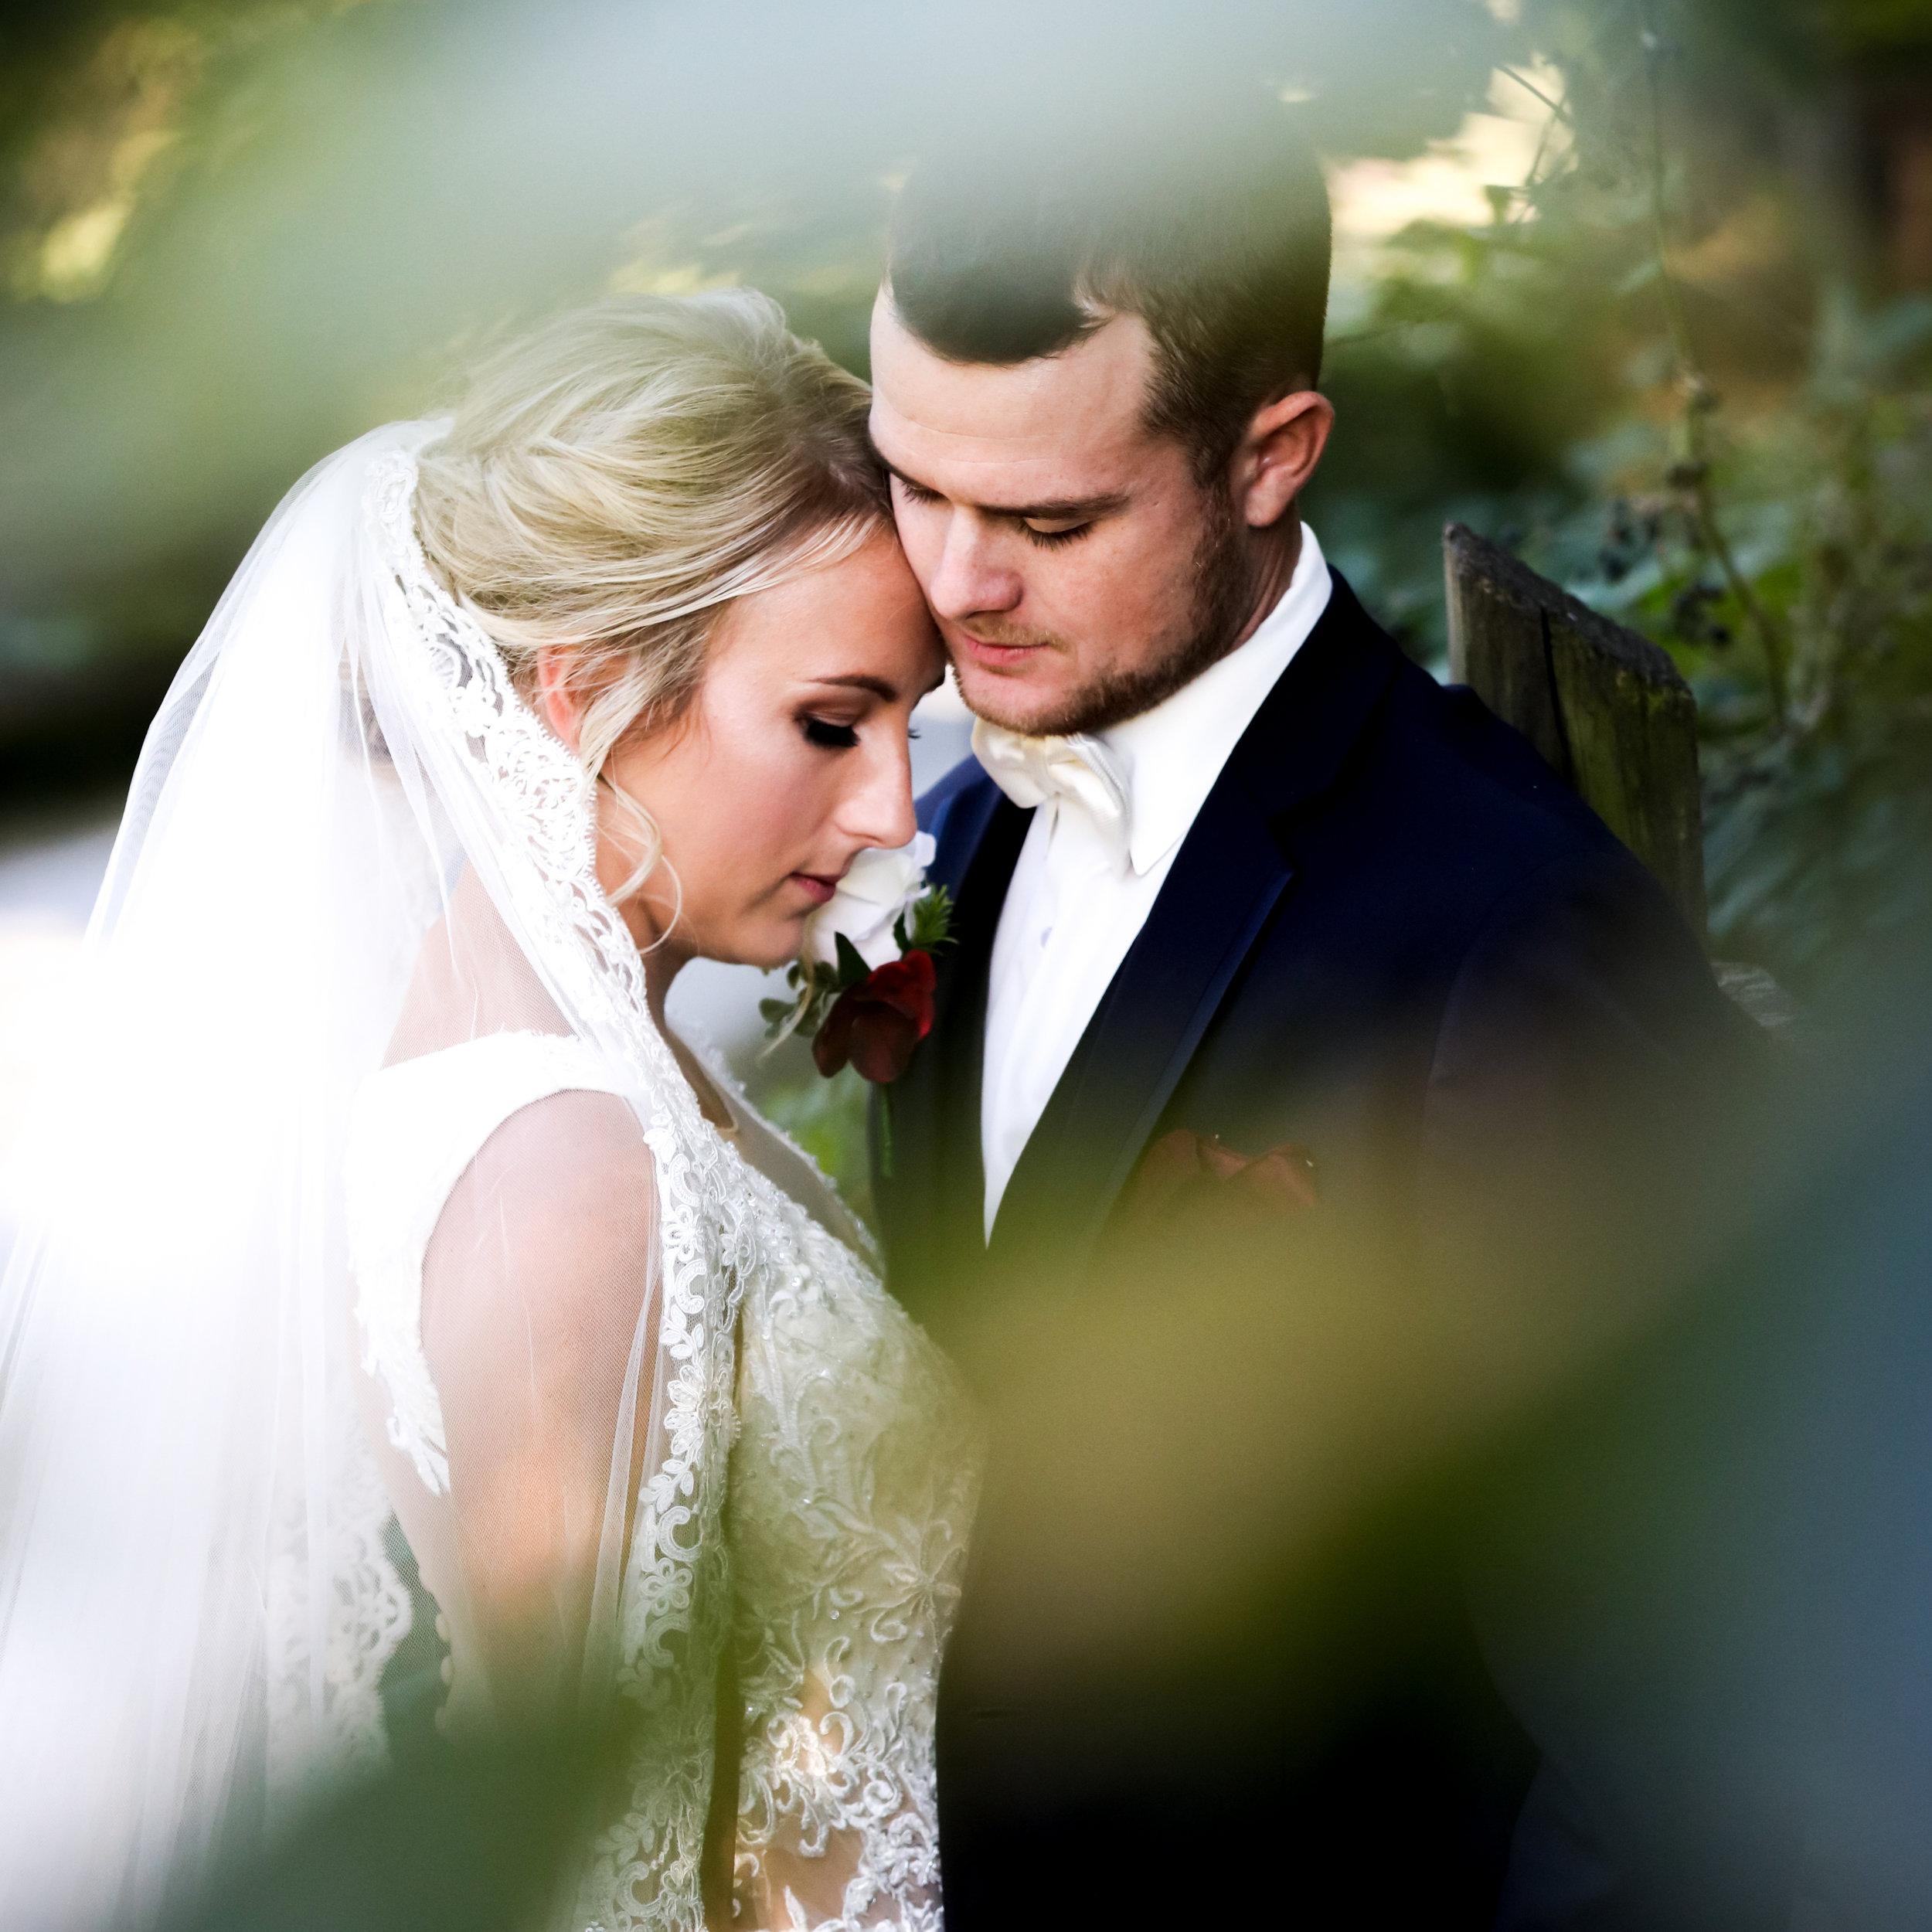 WeddingWebsite-79.jpg